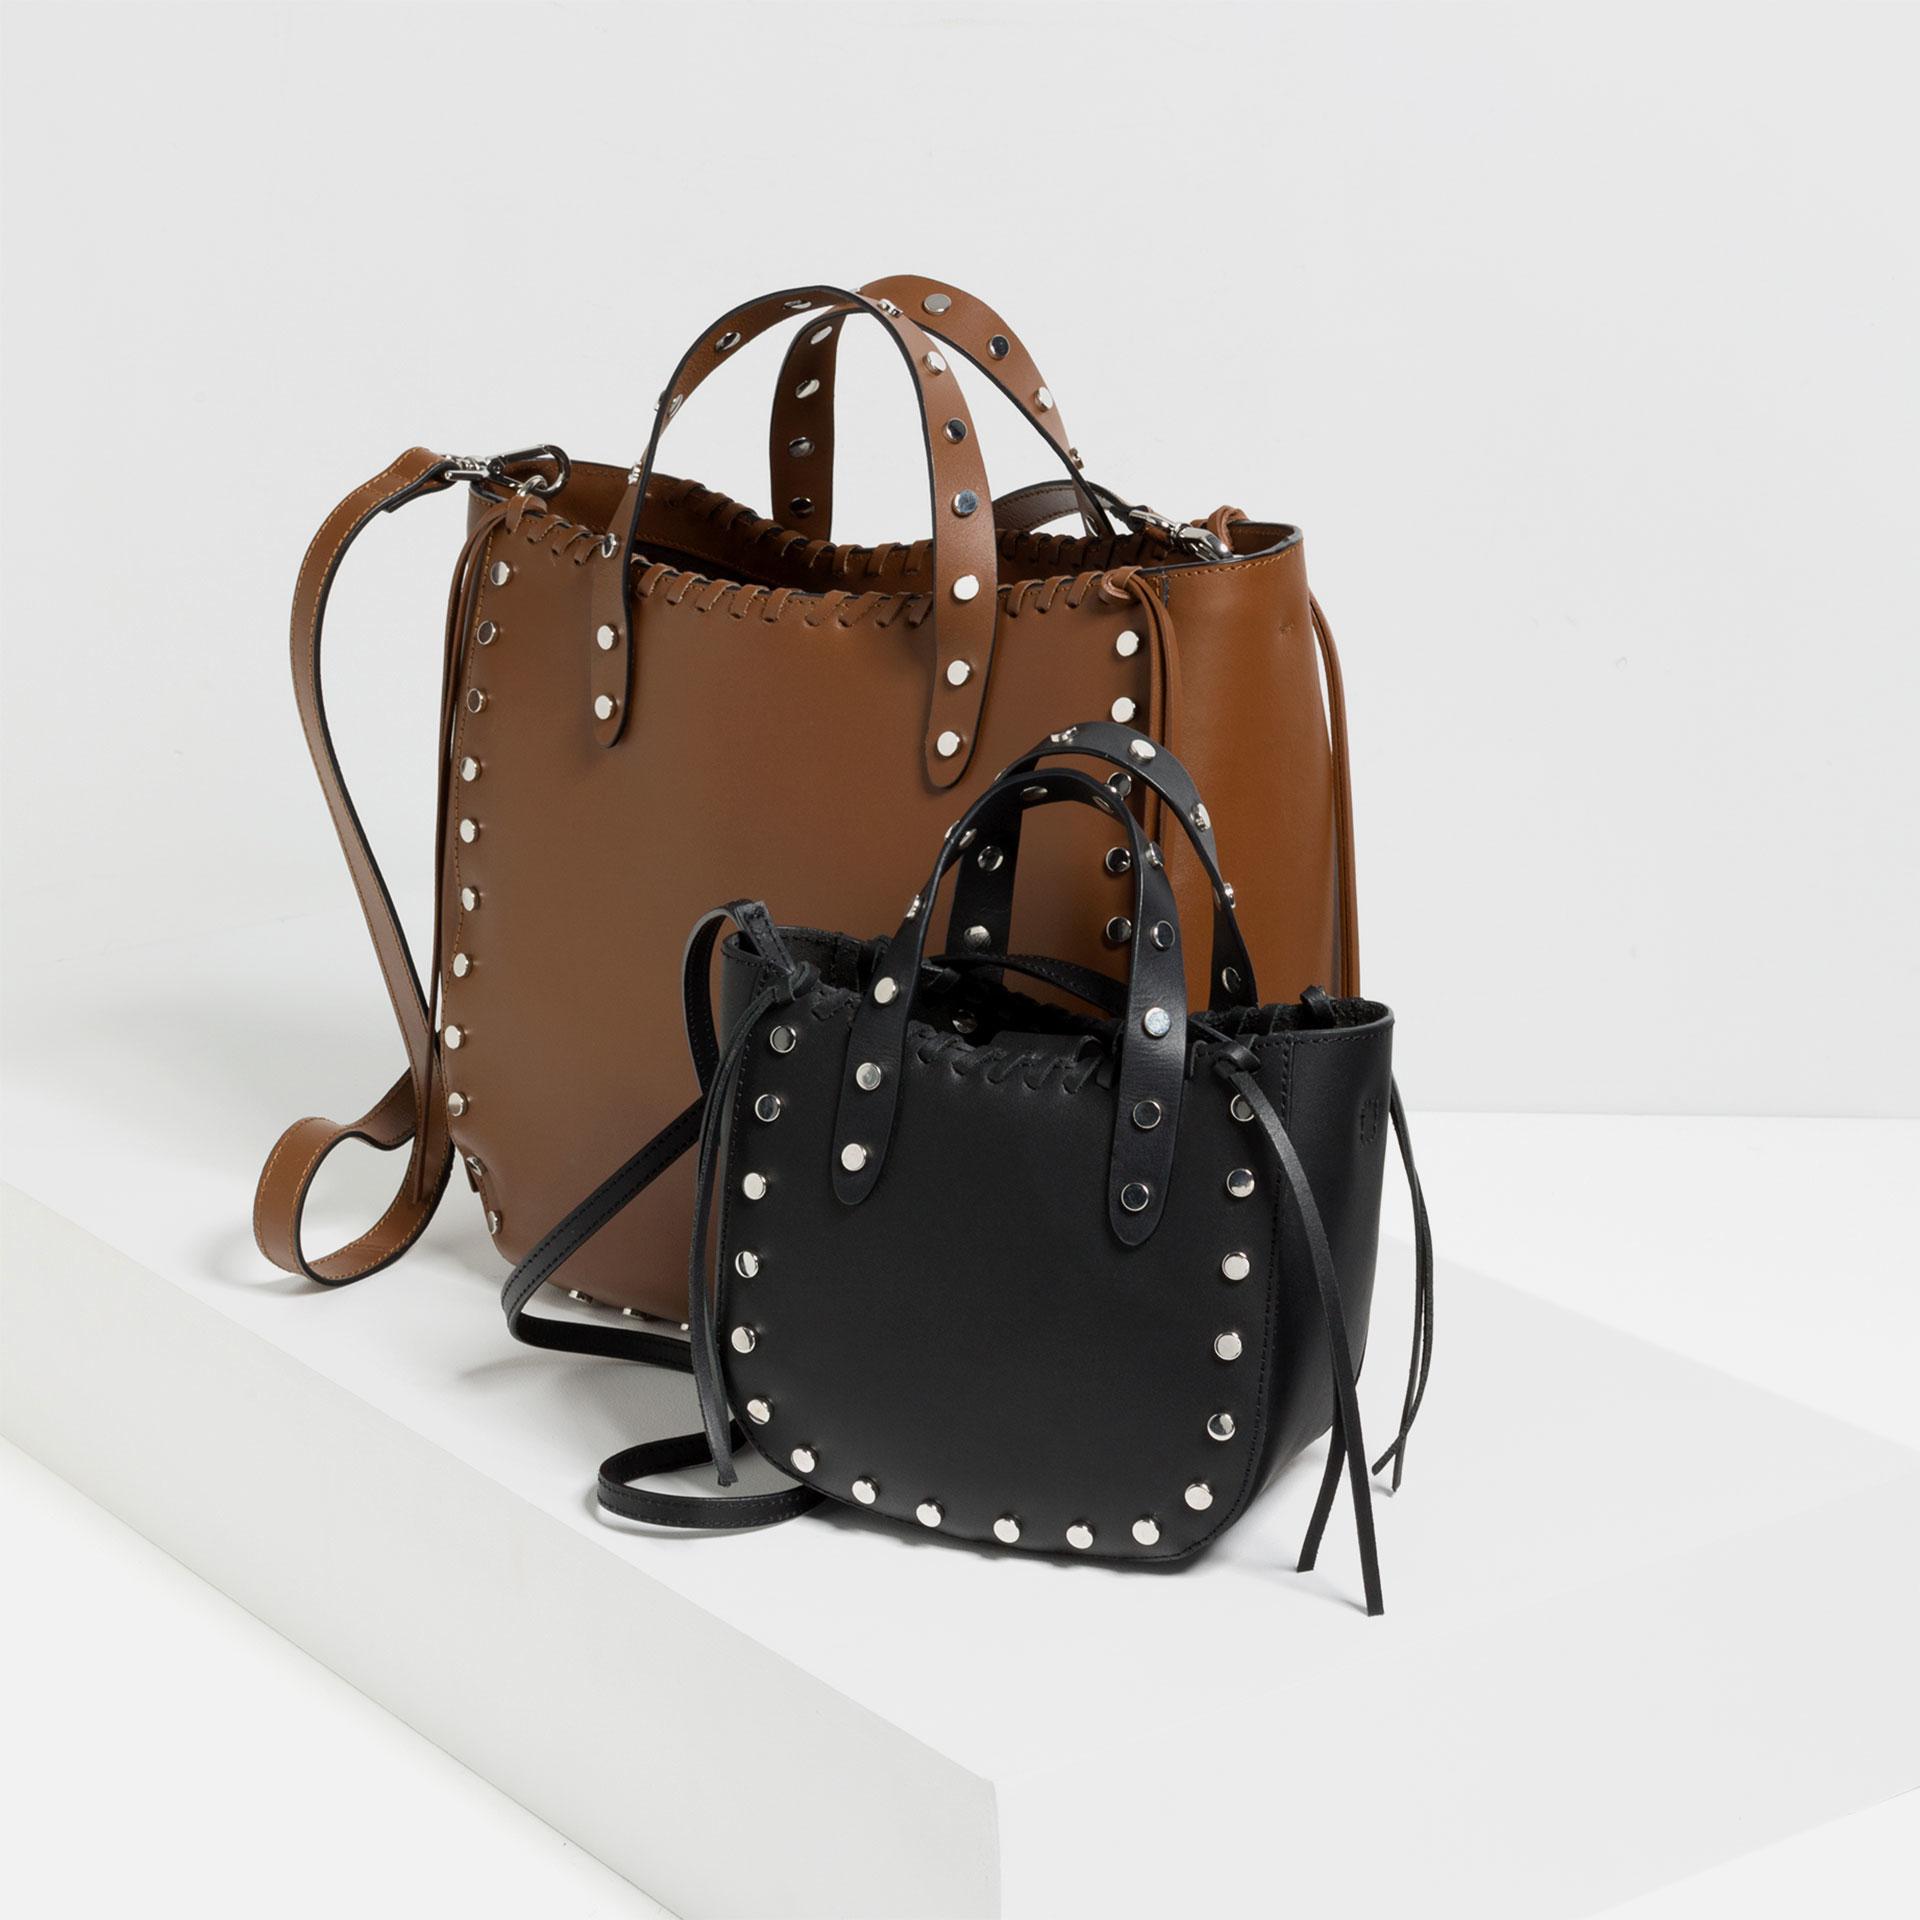 Mini leather tote bag zara - Zara Shoulder Bag Gallery